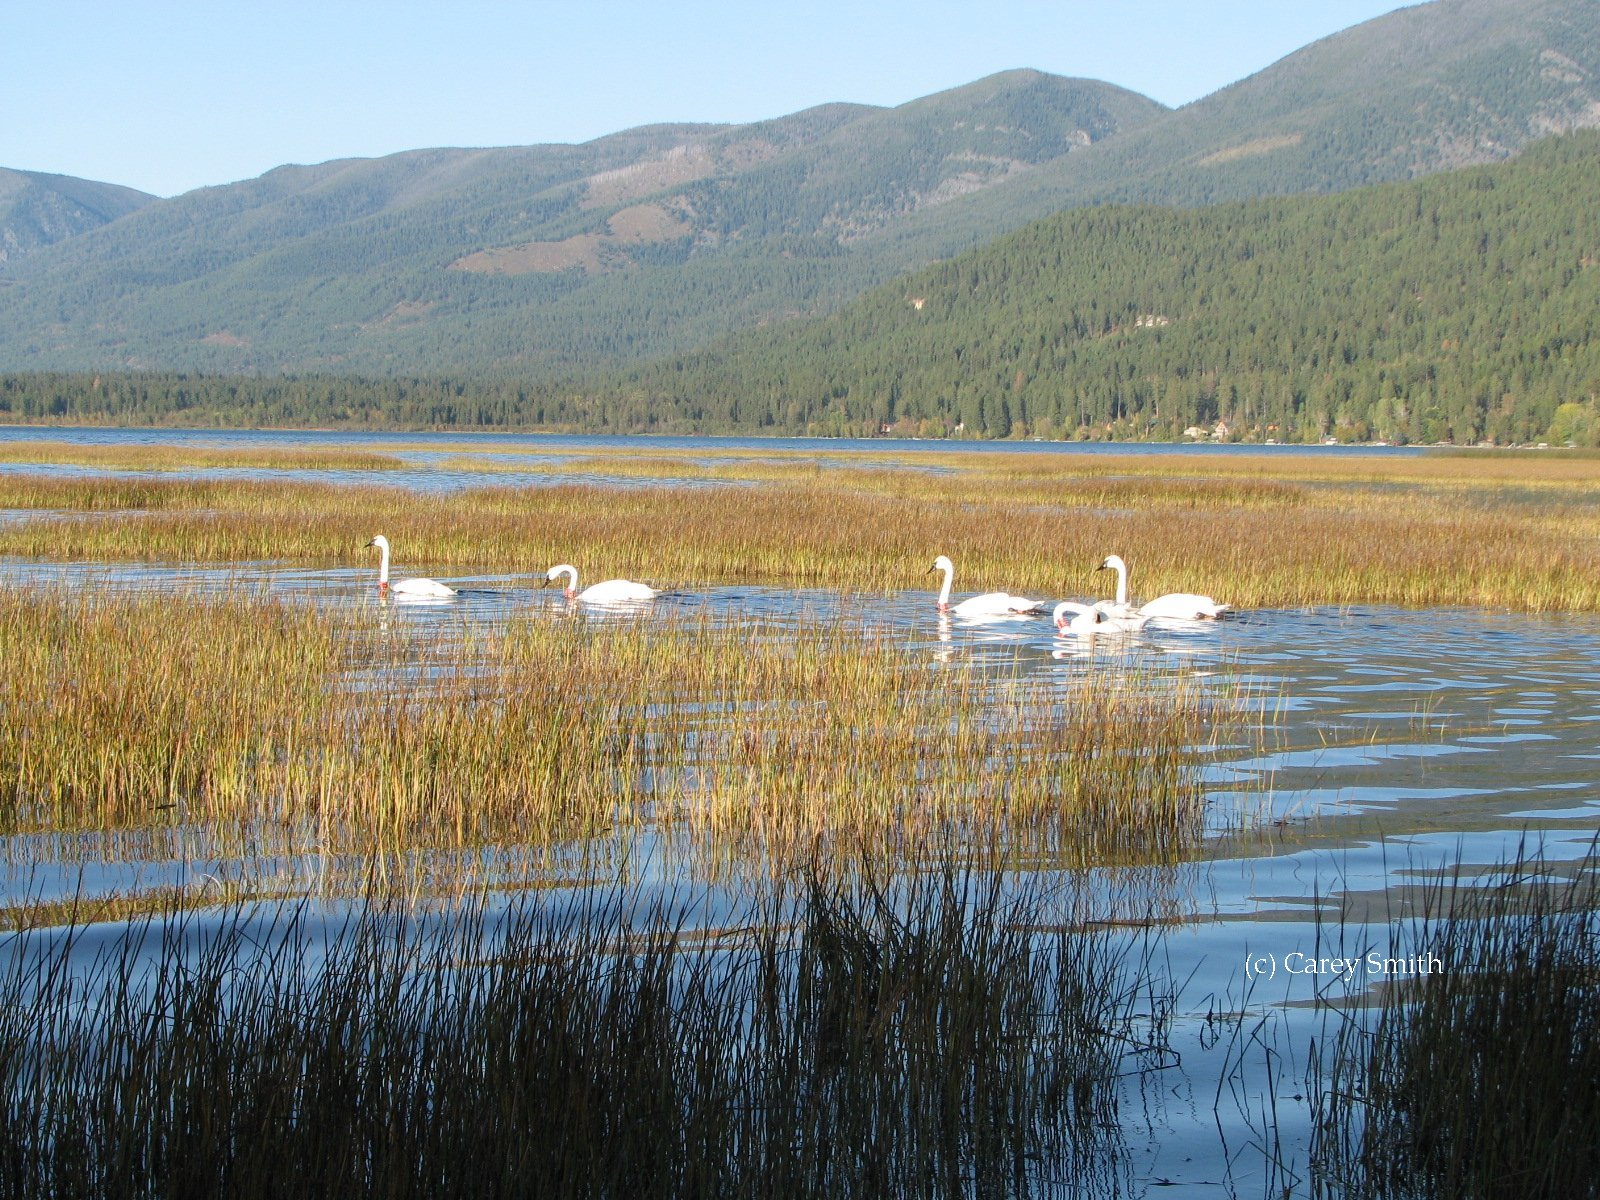 Confederated Salish and Kootenai Tribe's northwest Montana swan restoration